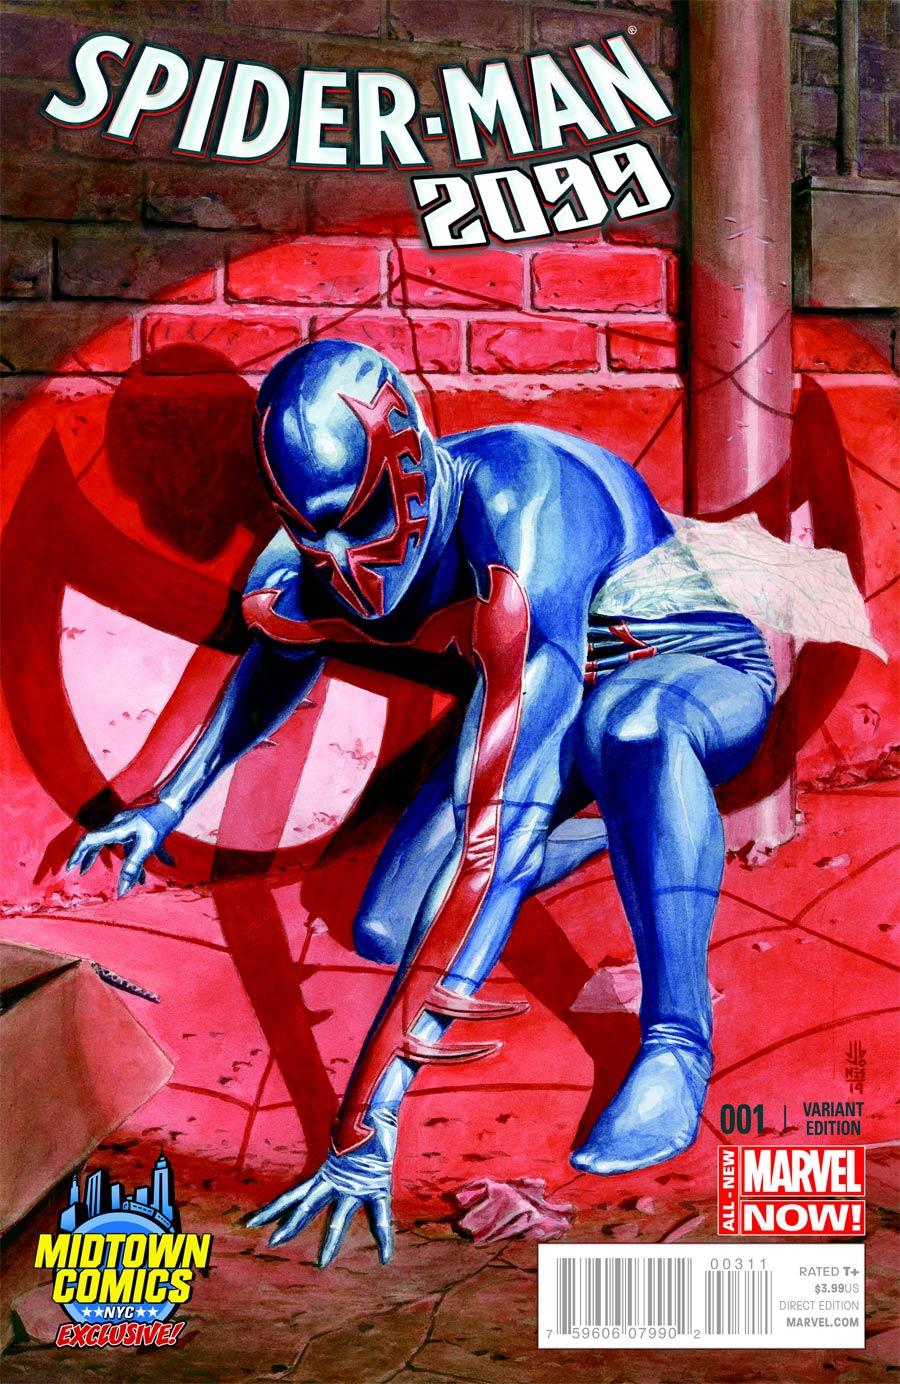 Spider-Man 2099 Vol 2 #1 Cover B Midtown Exclusive JG Jones Variant Cover